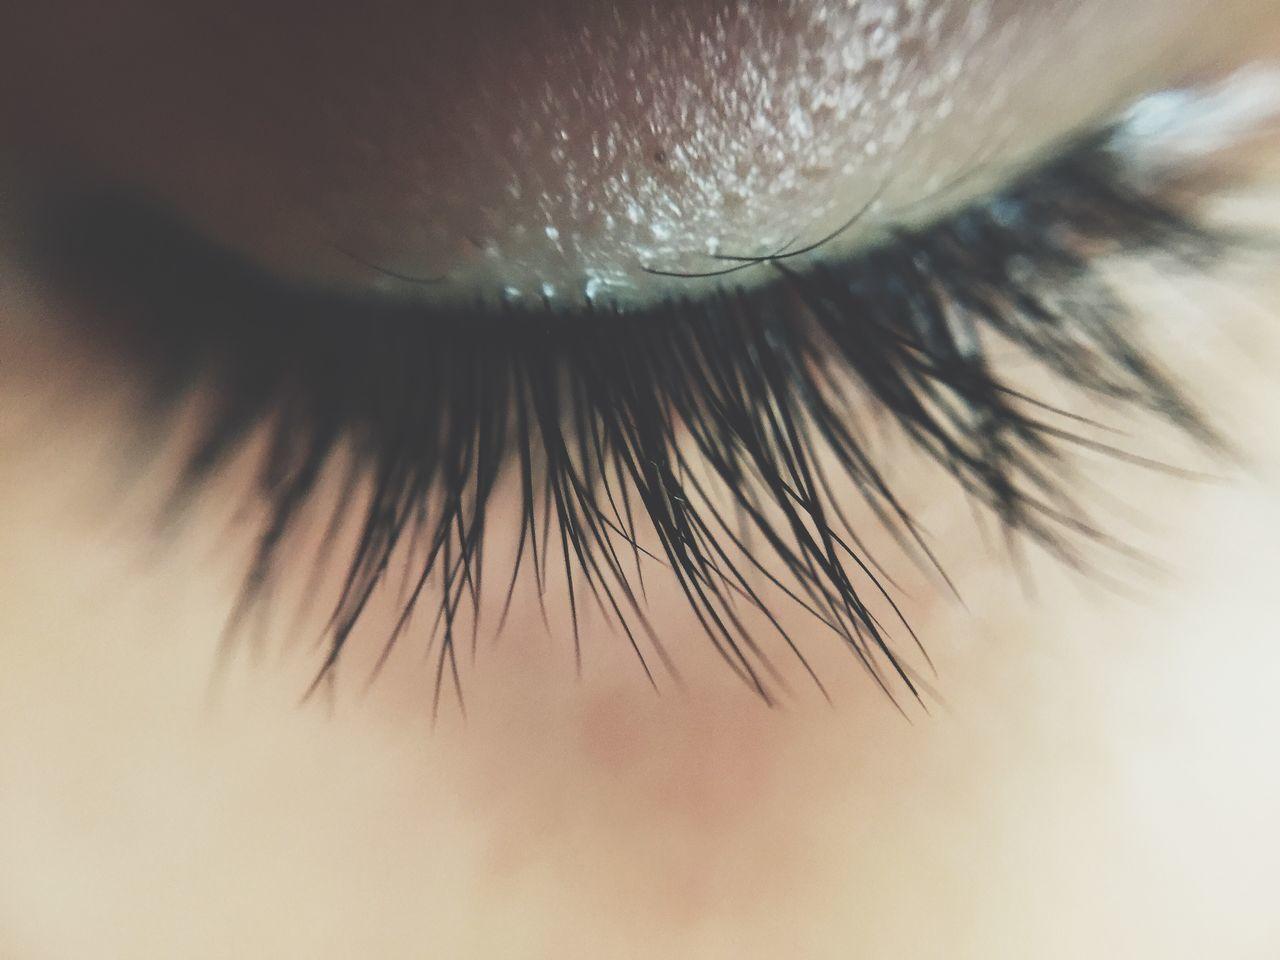 Macro shot of closed eye